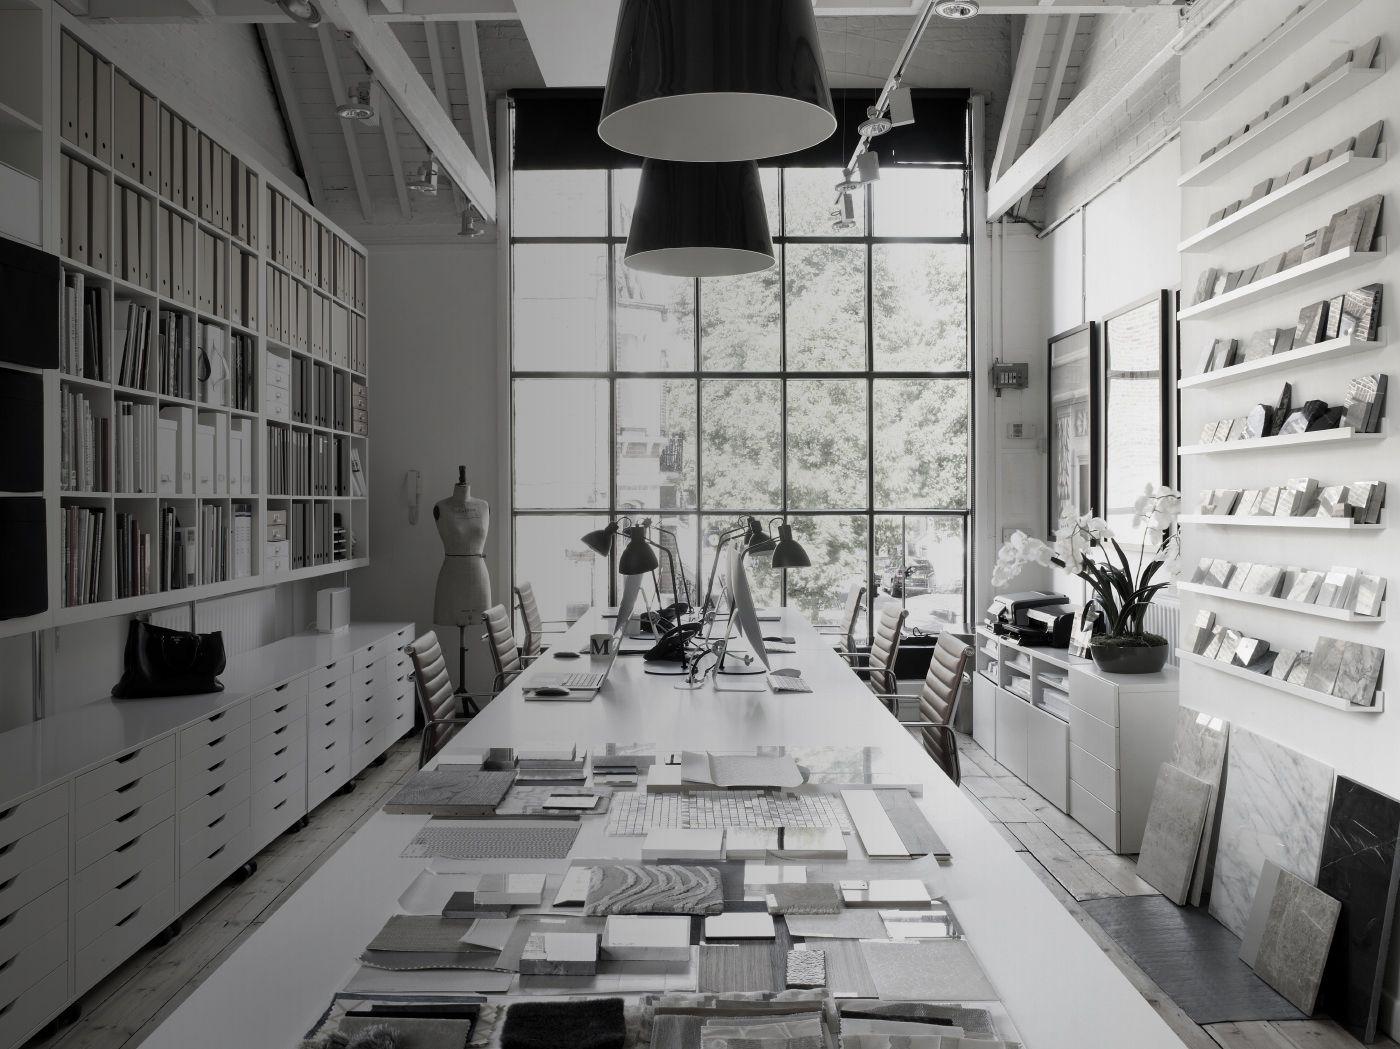 Top 25 interior design stores in the